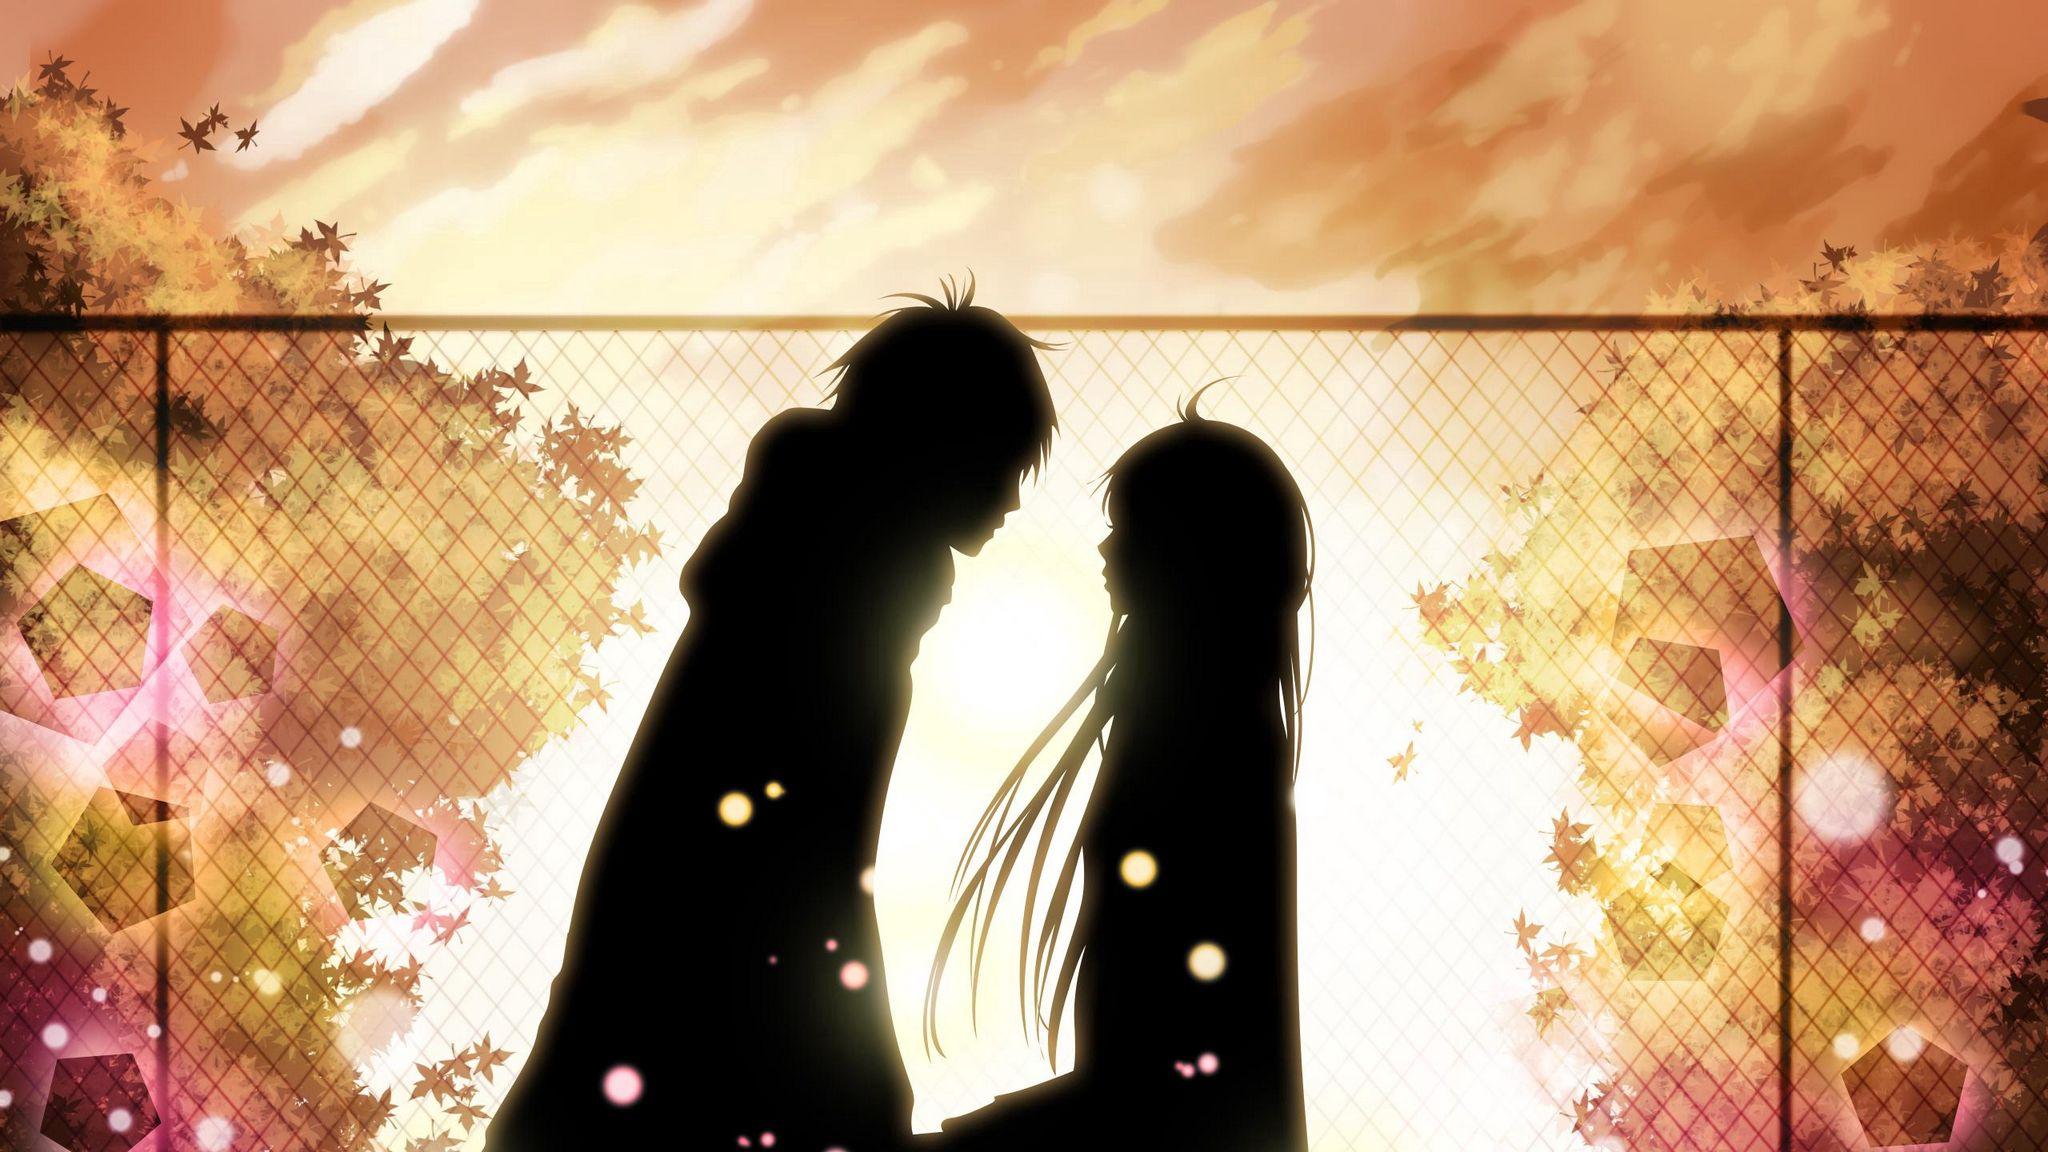 2048x1152 Wallpaper kimi ni todoke, girl, boy, love, feelings, meet, date, fall, leaves